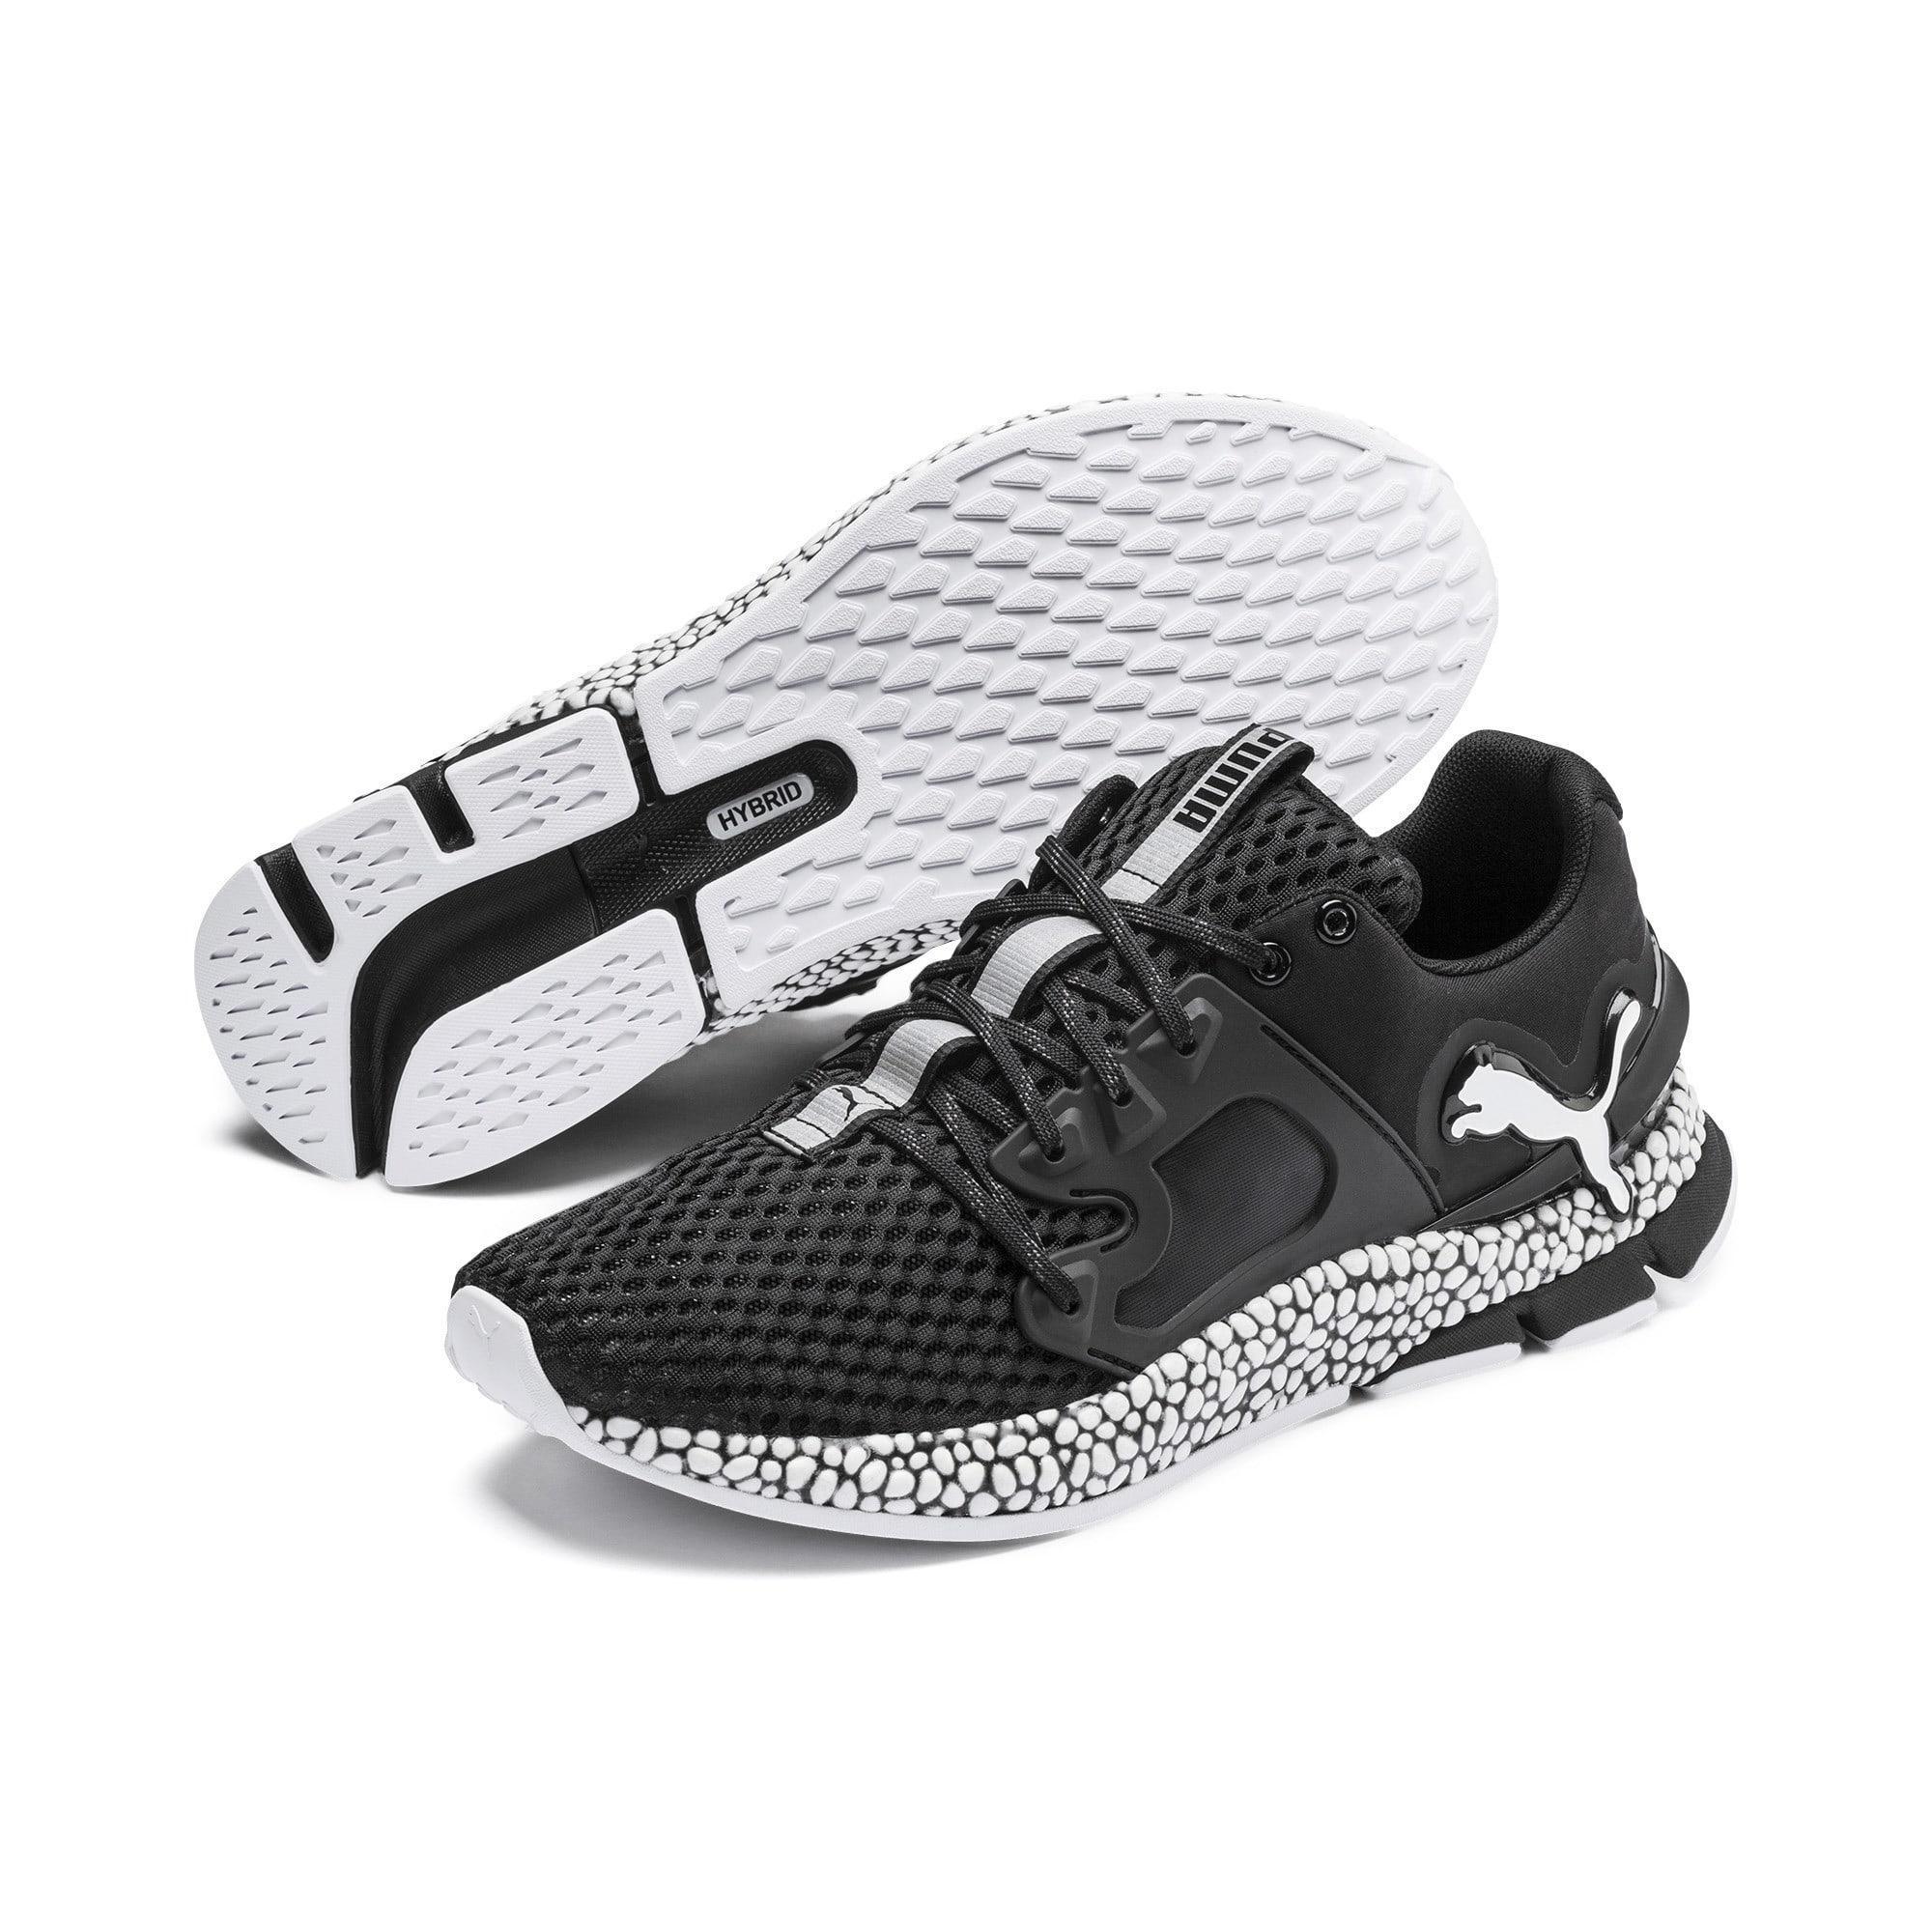 Nombre provisional Flor de la ciudad Significativo  PUMA Lace Hybrid Sky Men's Running Shoes in 03 (Black) - Save 51 ...